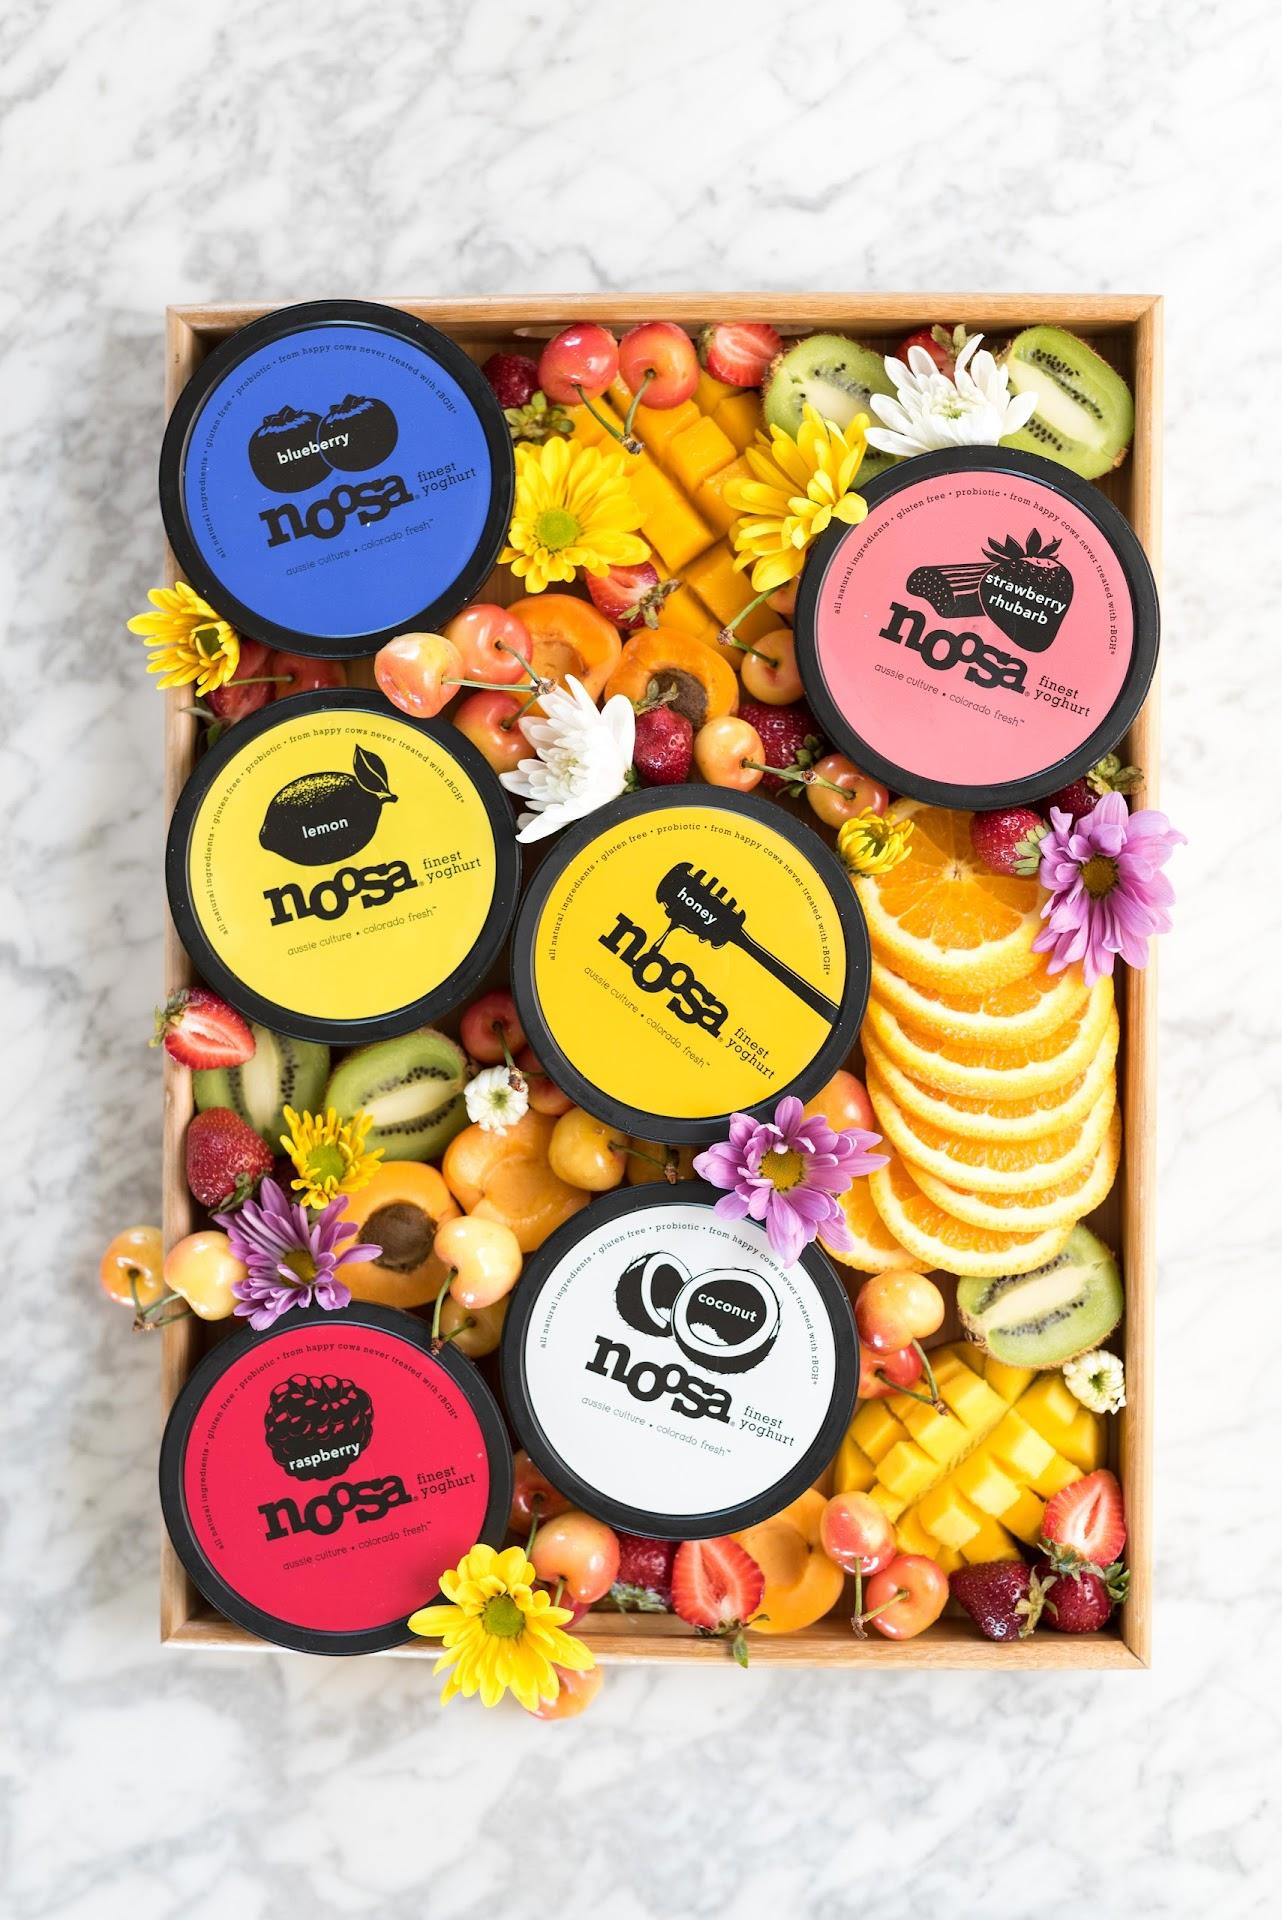 breakfast, breakfast tray, fruit platter, ultimate fruit platter, pretty, unique, yogurt toppings, summer fruit, fruit photography, food blogger, utah, lds, noosa review, best yogurt,